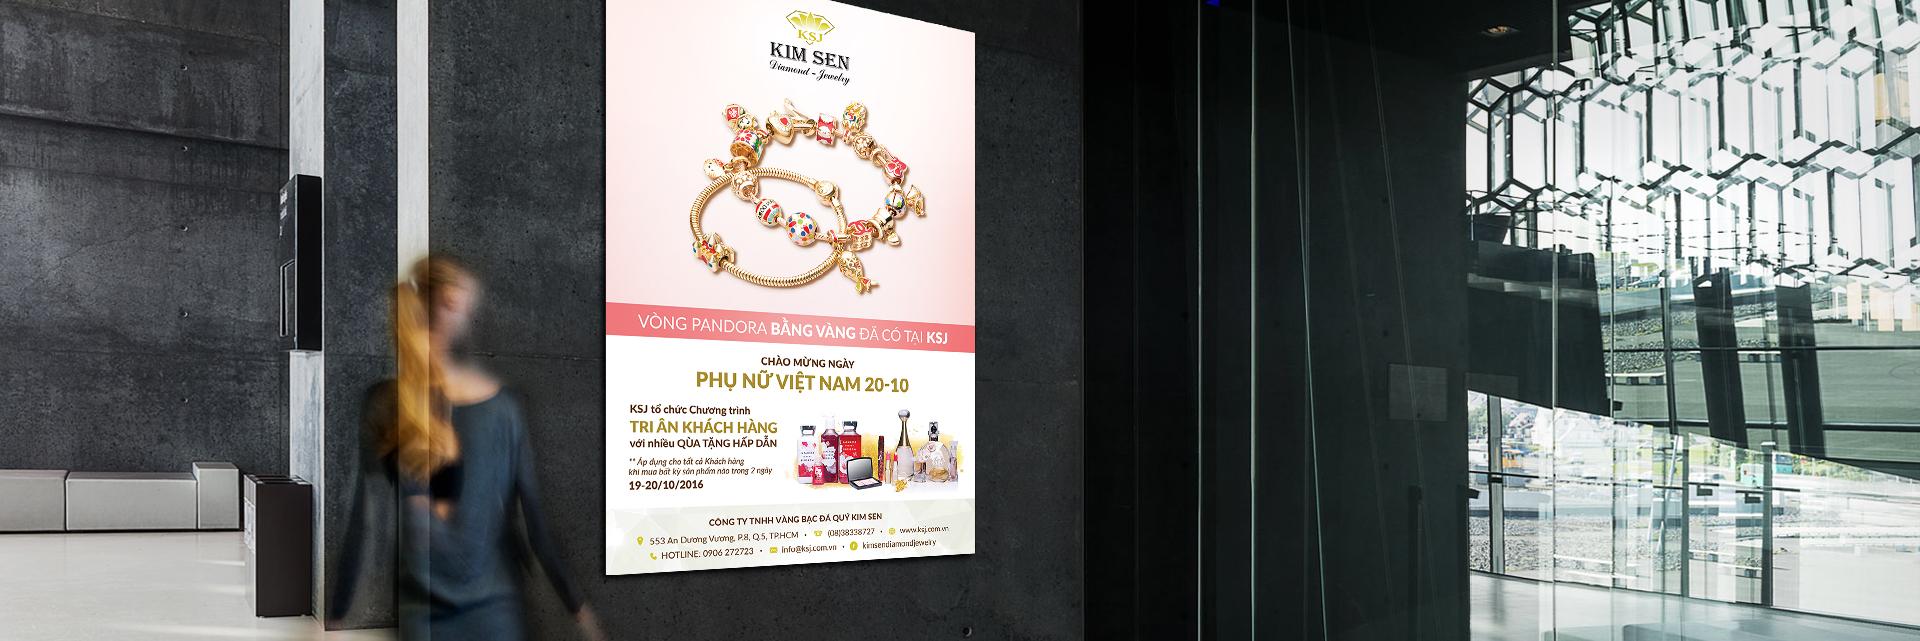 Kim-sen-jewelry-slide-2